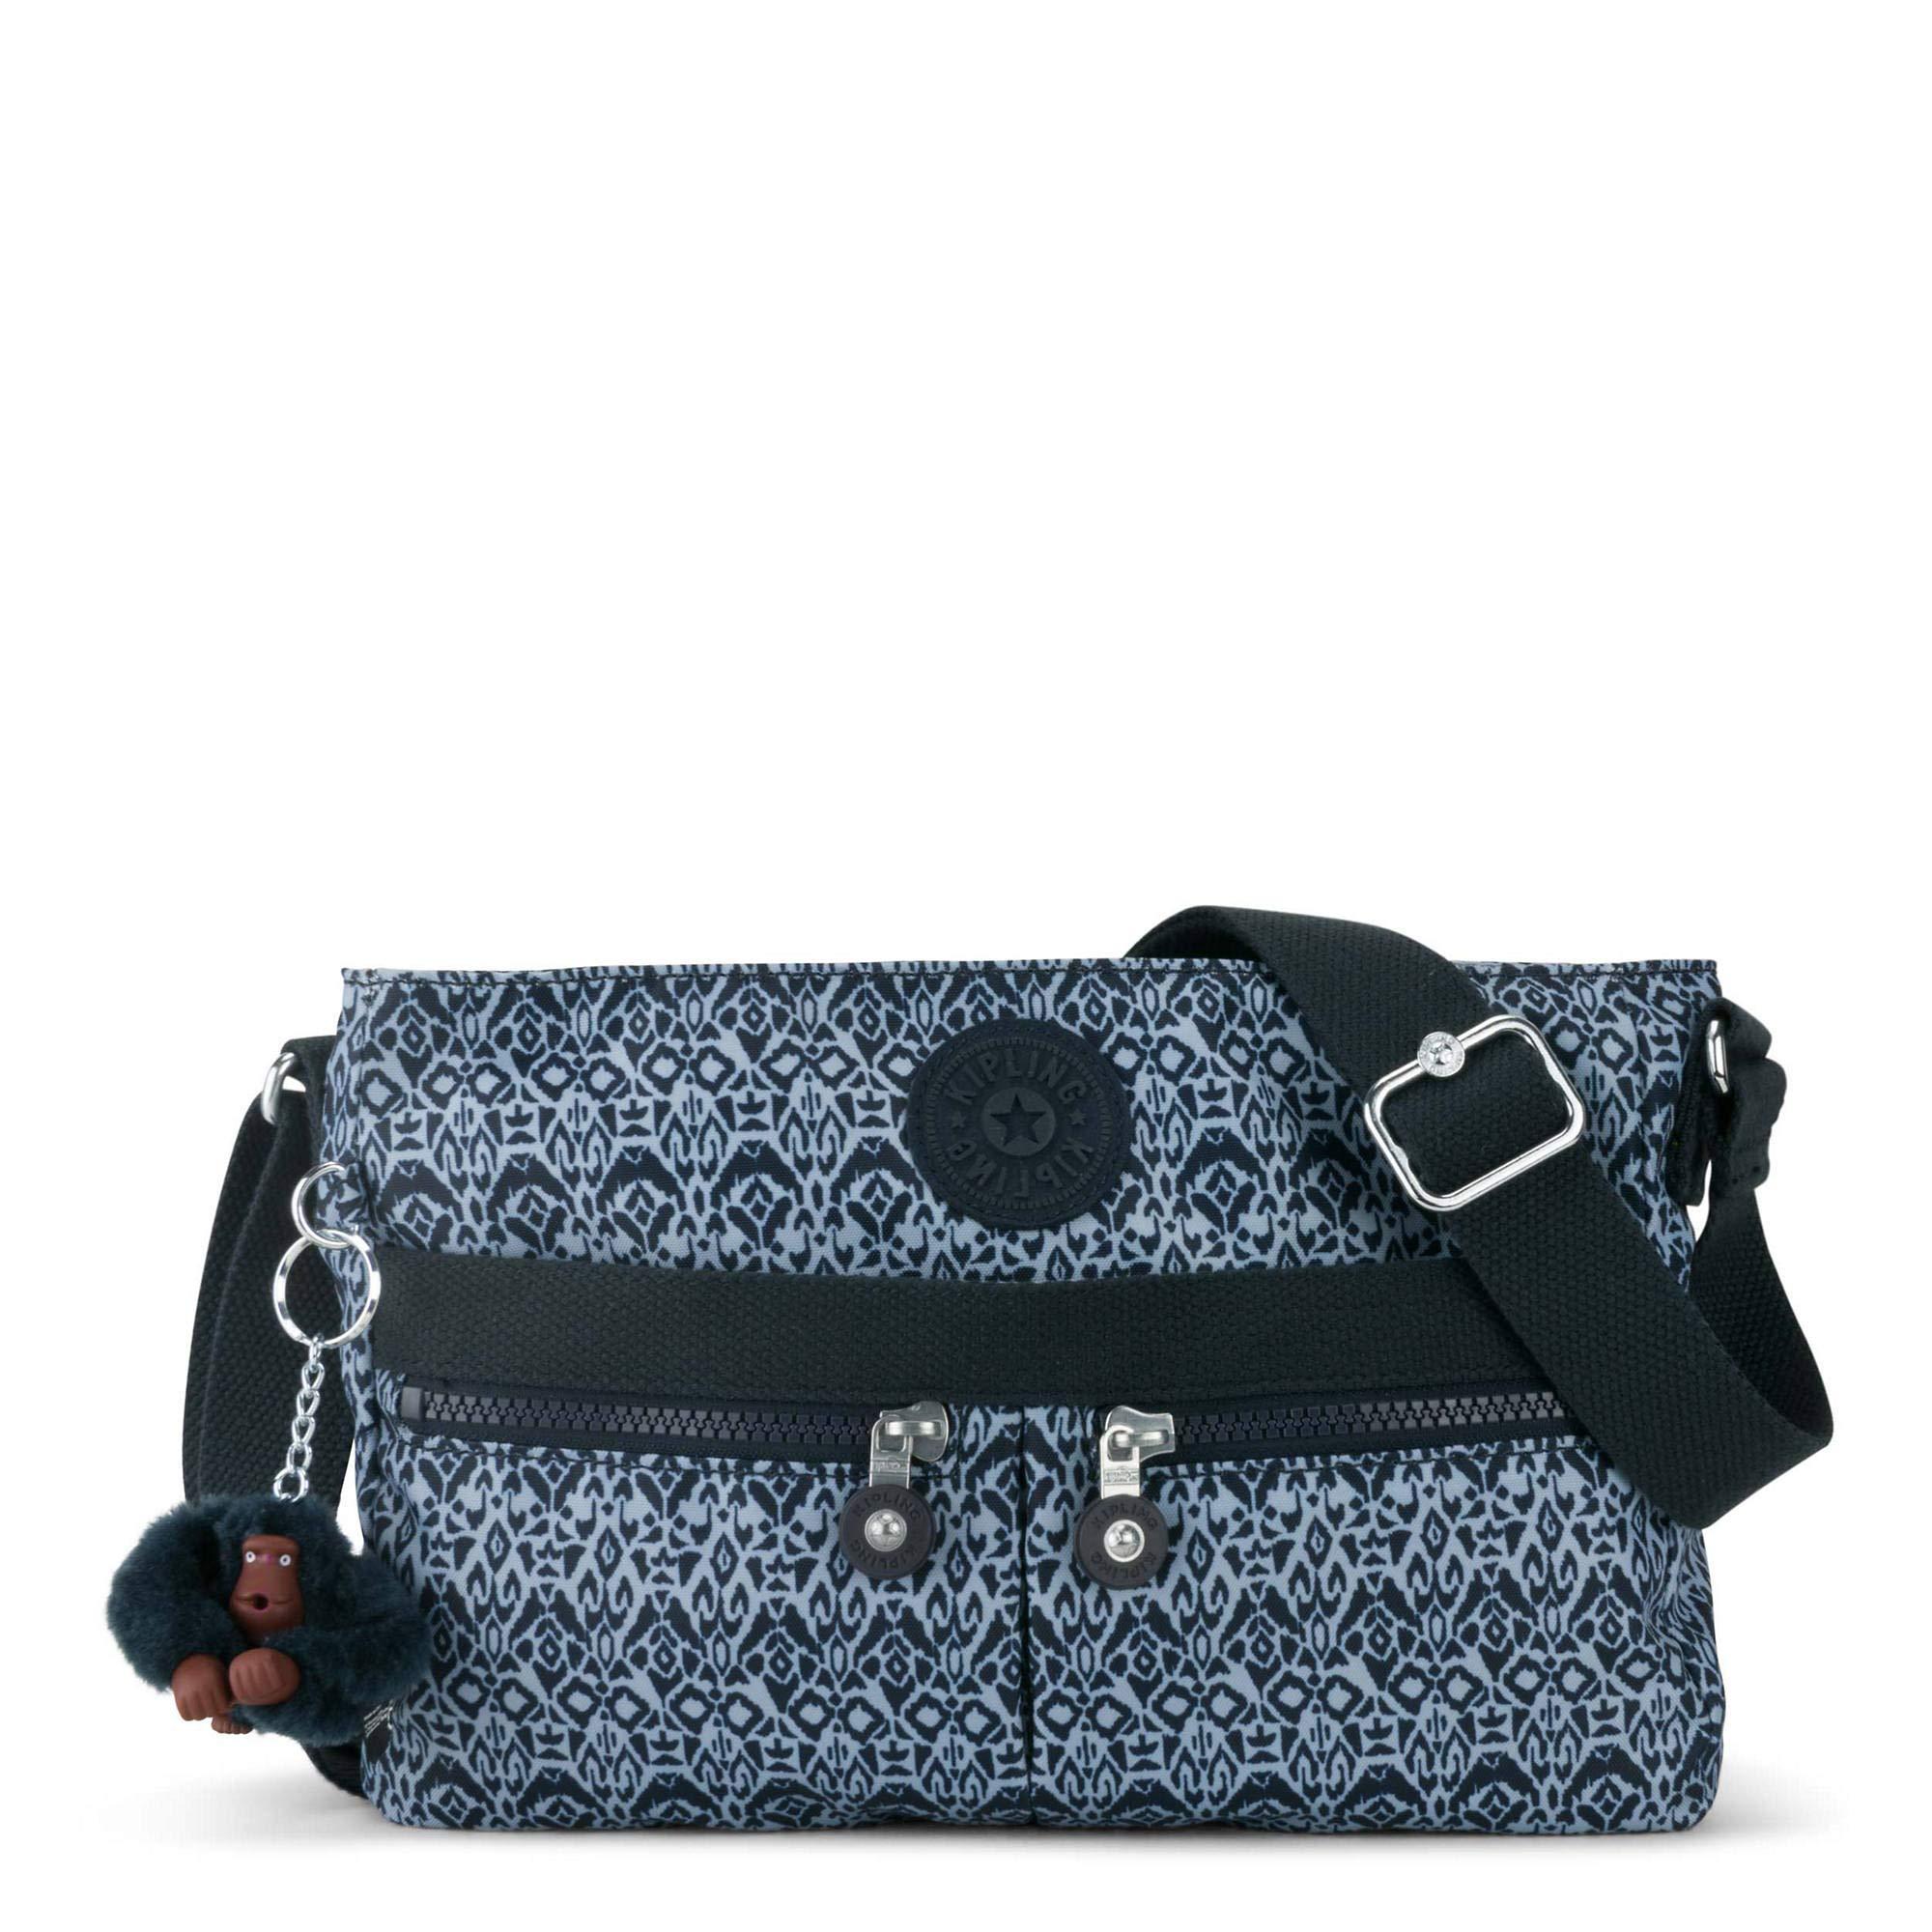 Kipling Angie Printed Crossbody Bag, Geometric Bliss